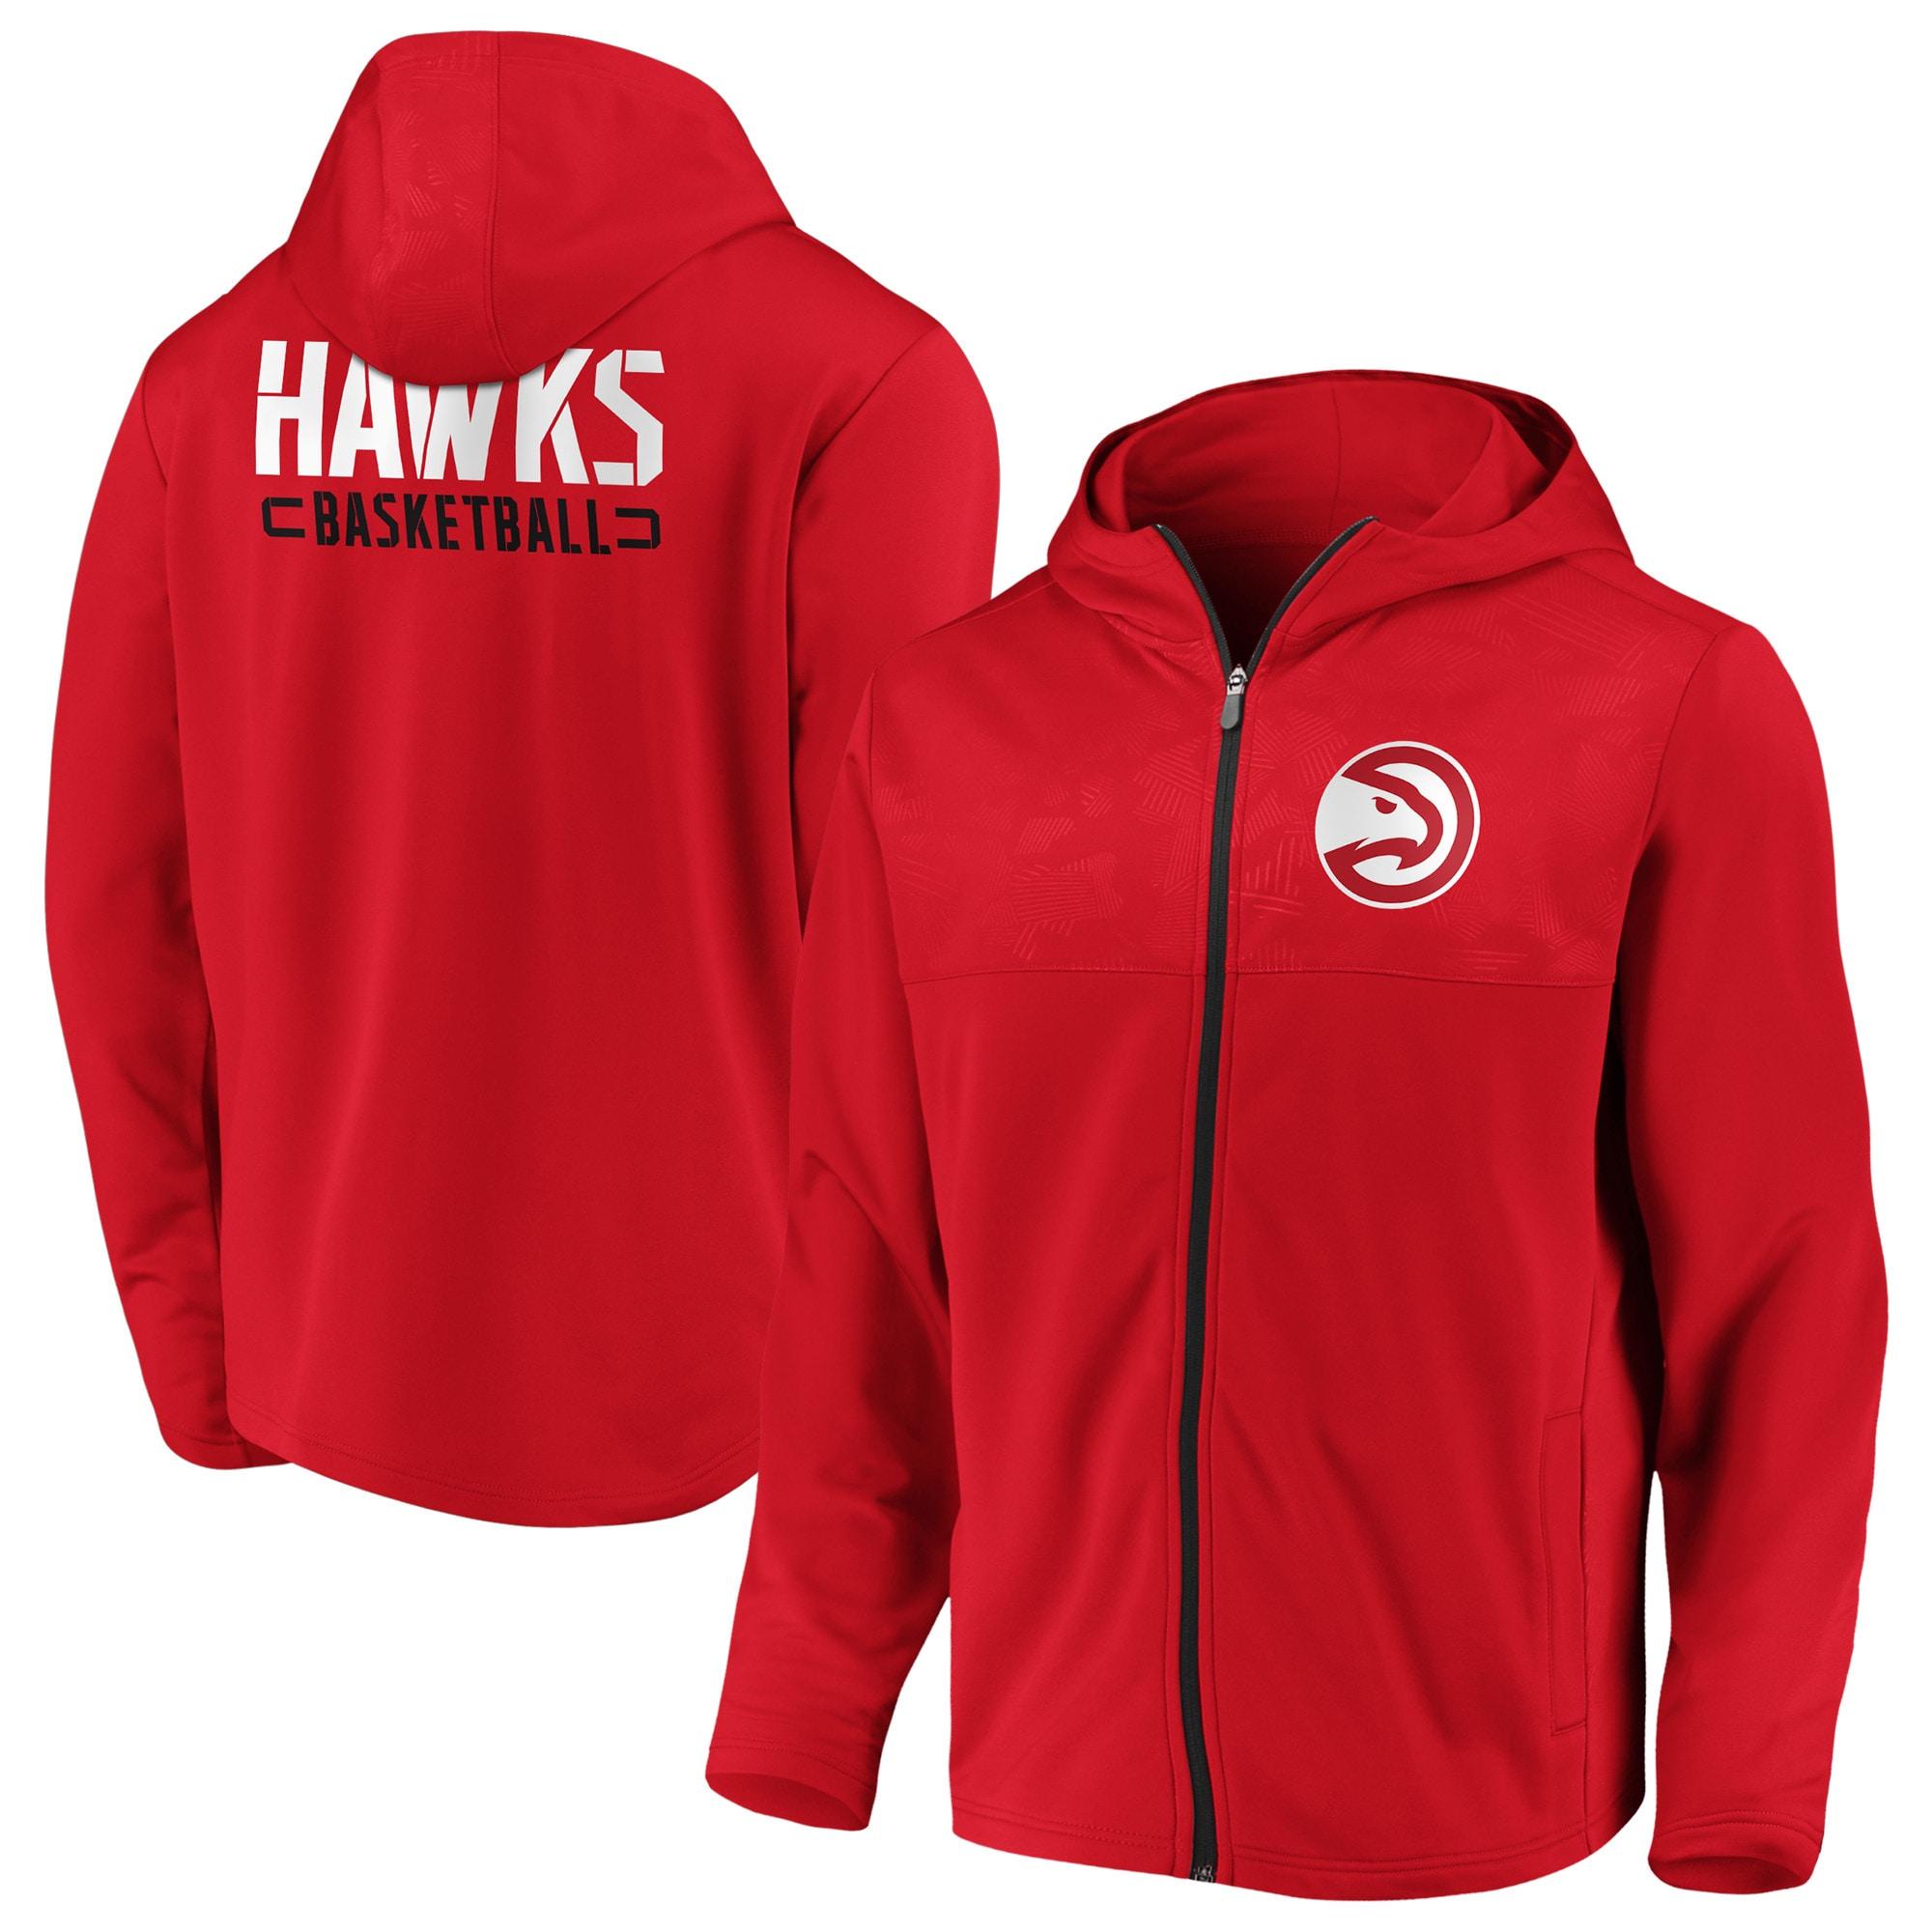 Atlanta Hawks Fanatics Branded Iconic Defender Mission Performance Primary Logo Full-Zip Hoodie - Red